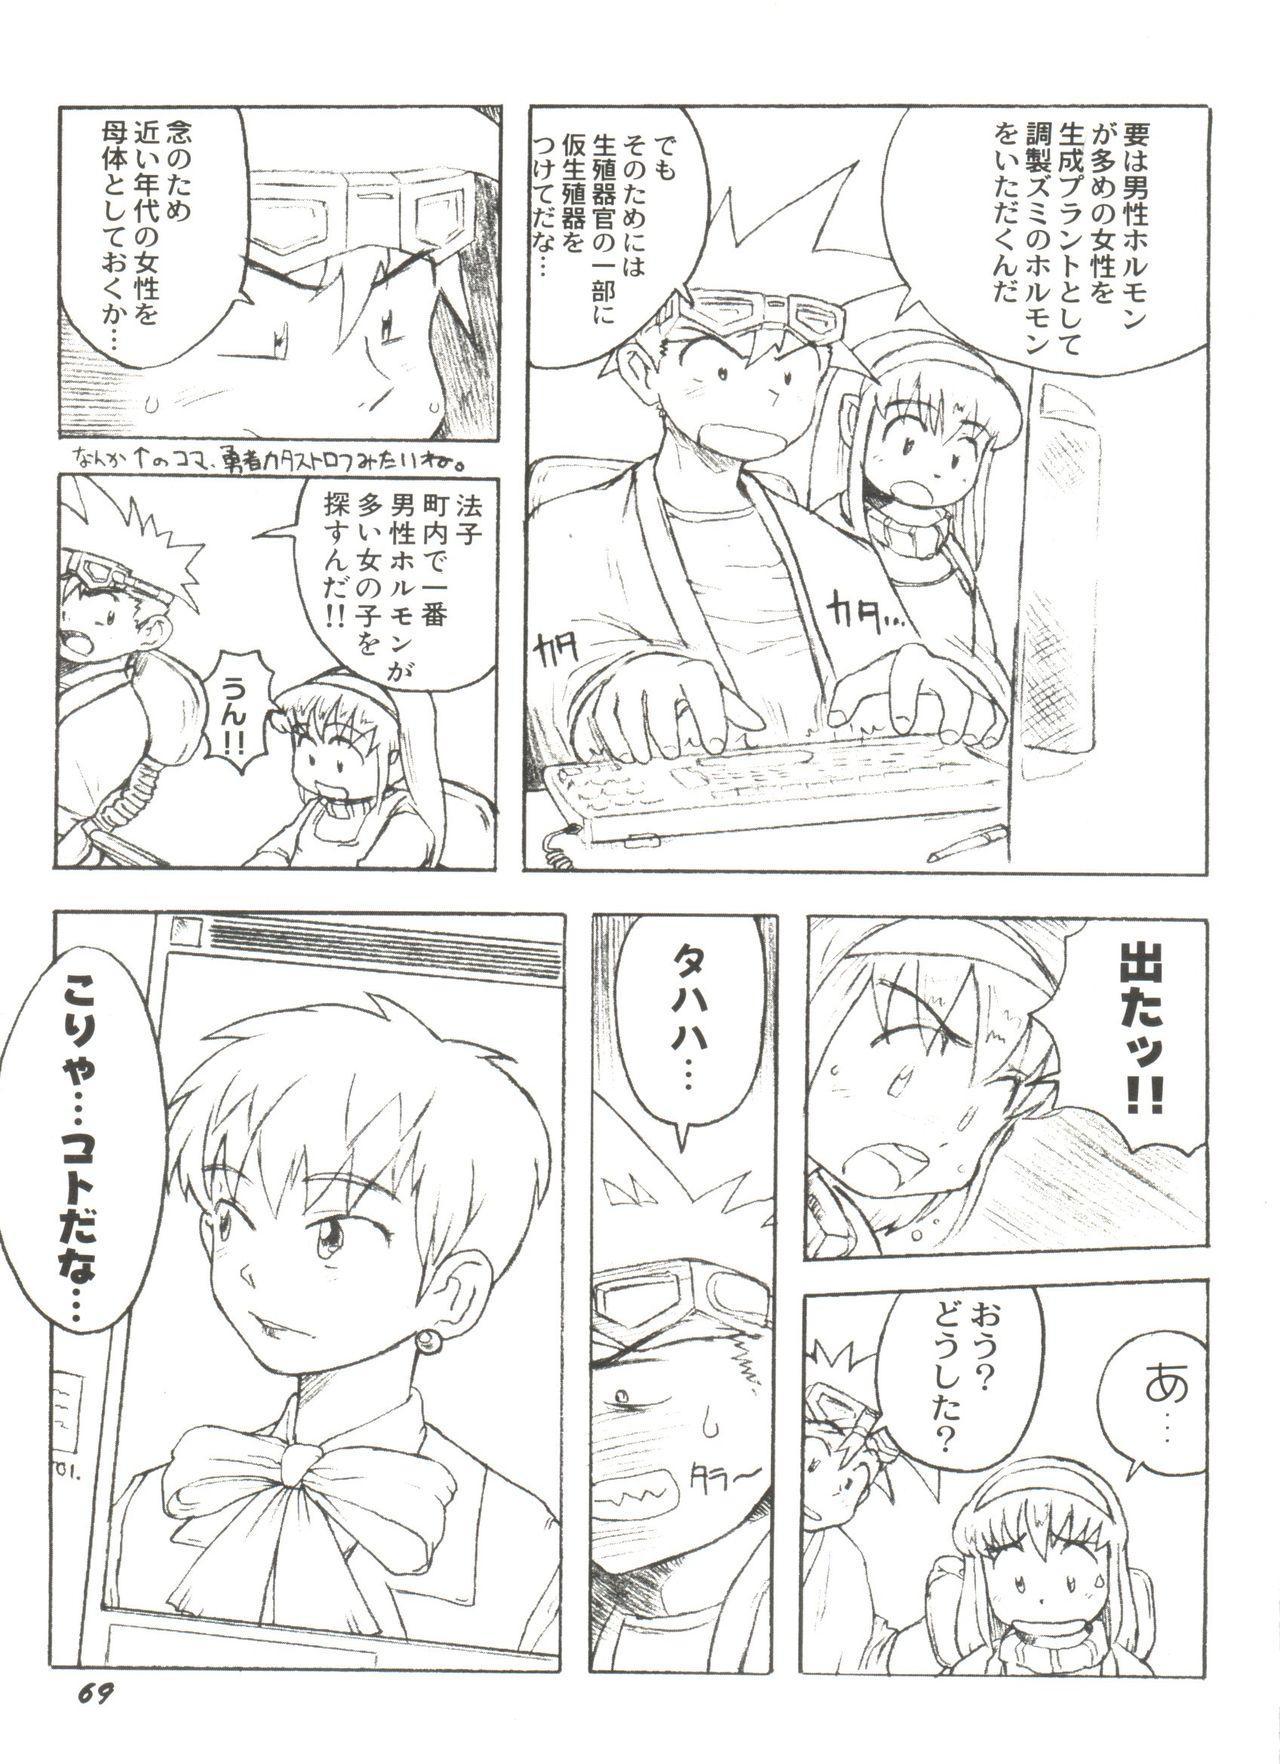 [Anthology] Denei Tamatebako 8 - Utakata no Tenshi-tachi II (Various) 70